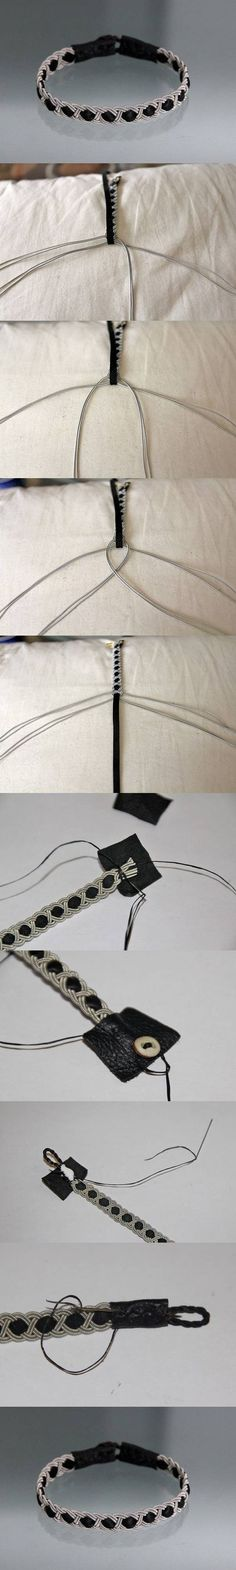 DIY Rope Wristband diy craft crafts craft ideas easy crafts diy ideas crafty easy diy kids crafts diy jewelry diy bracelet craft bracelet kids diy jewelry diy craft band